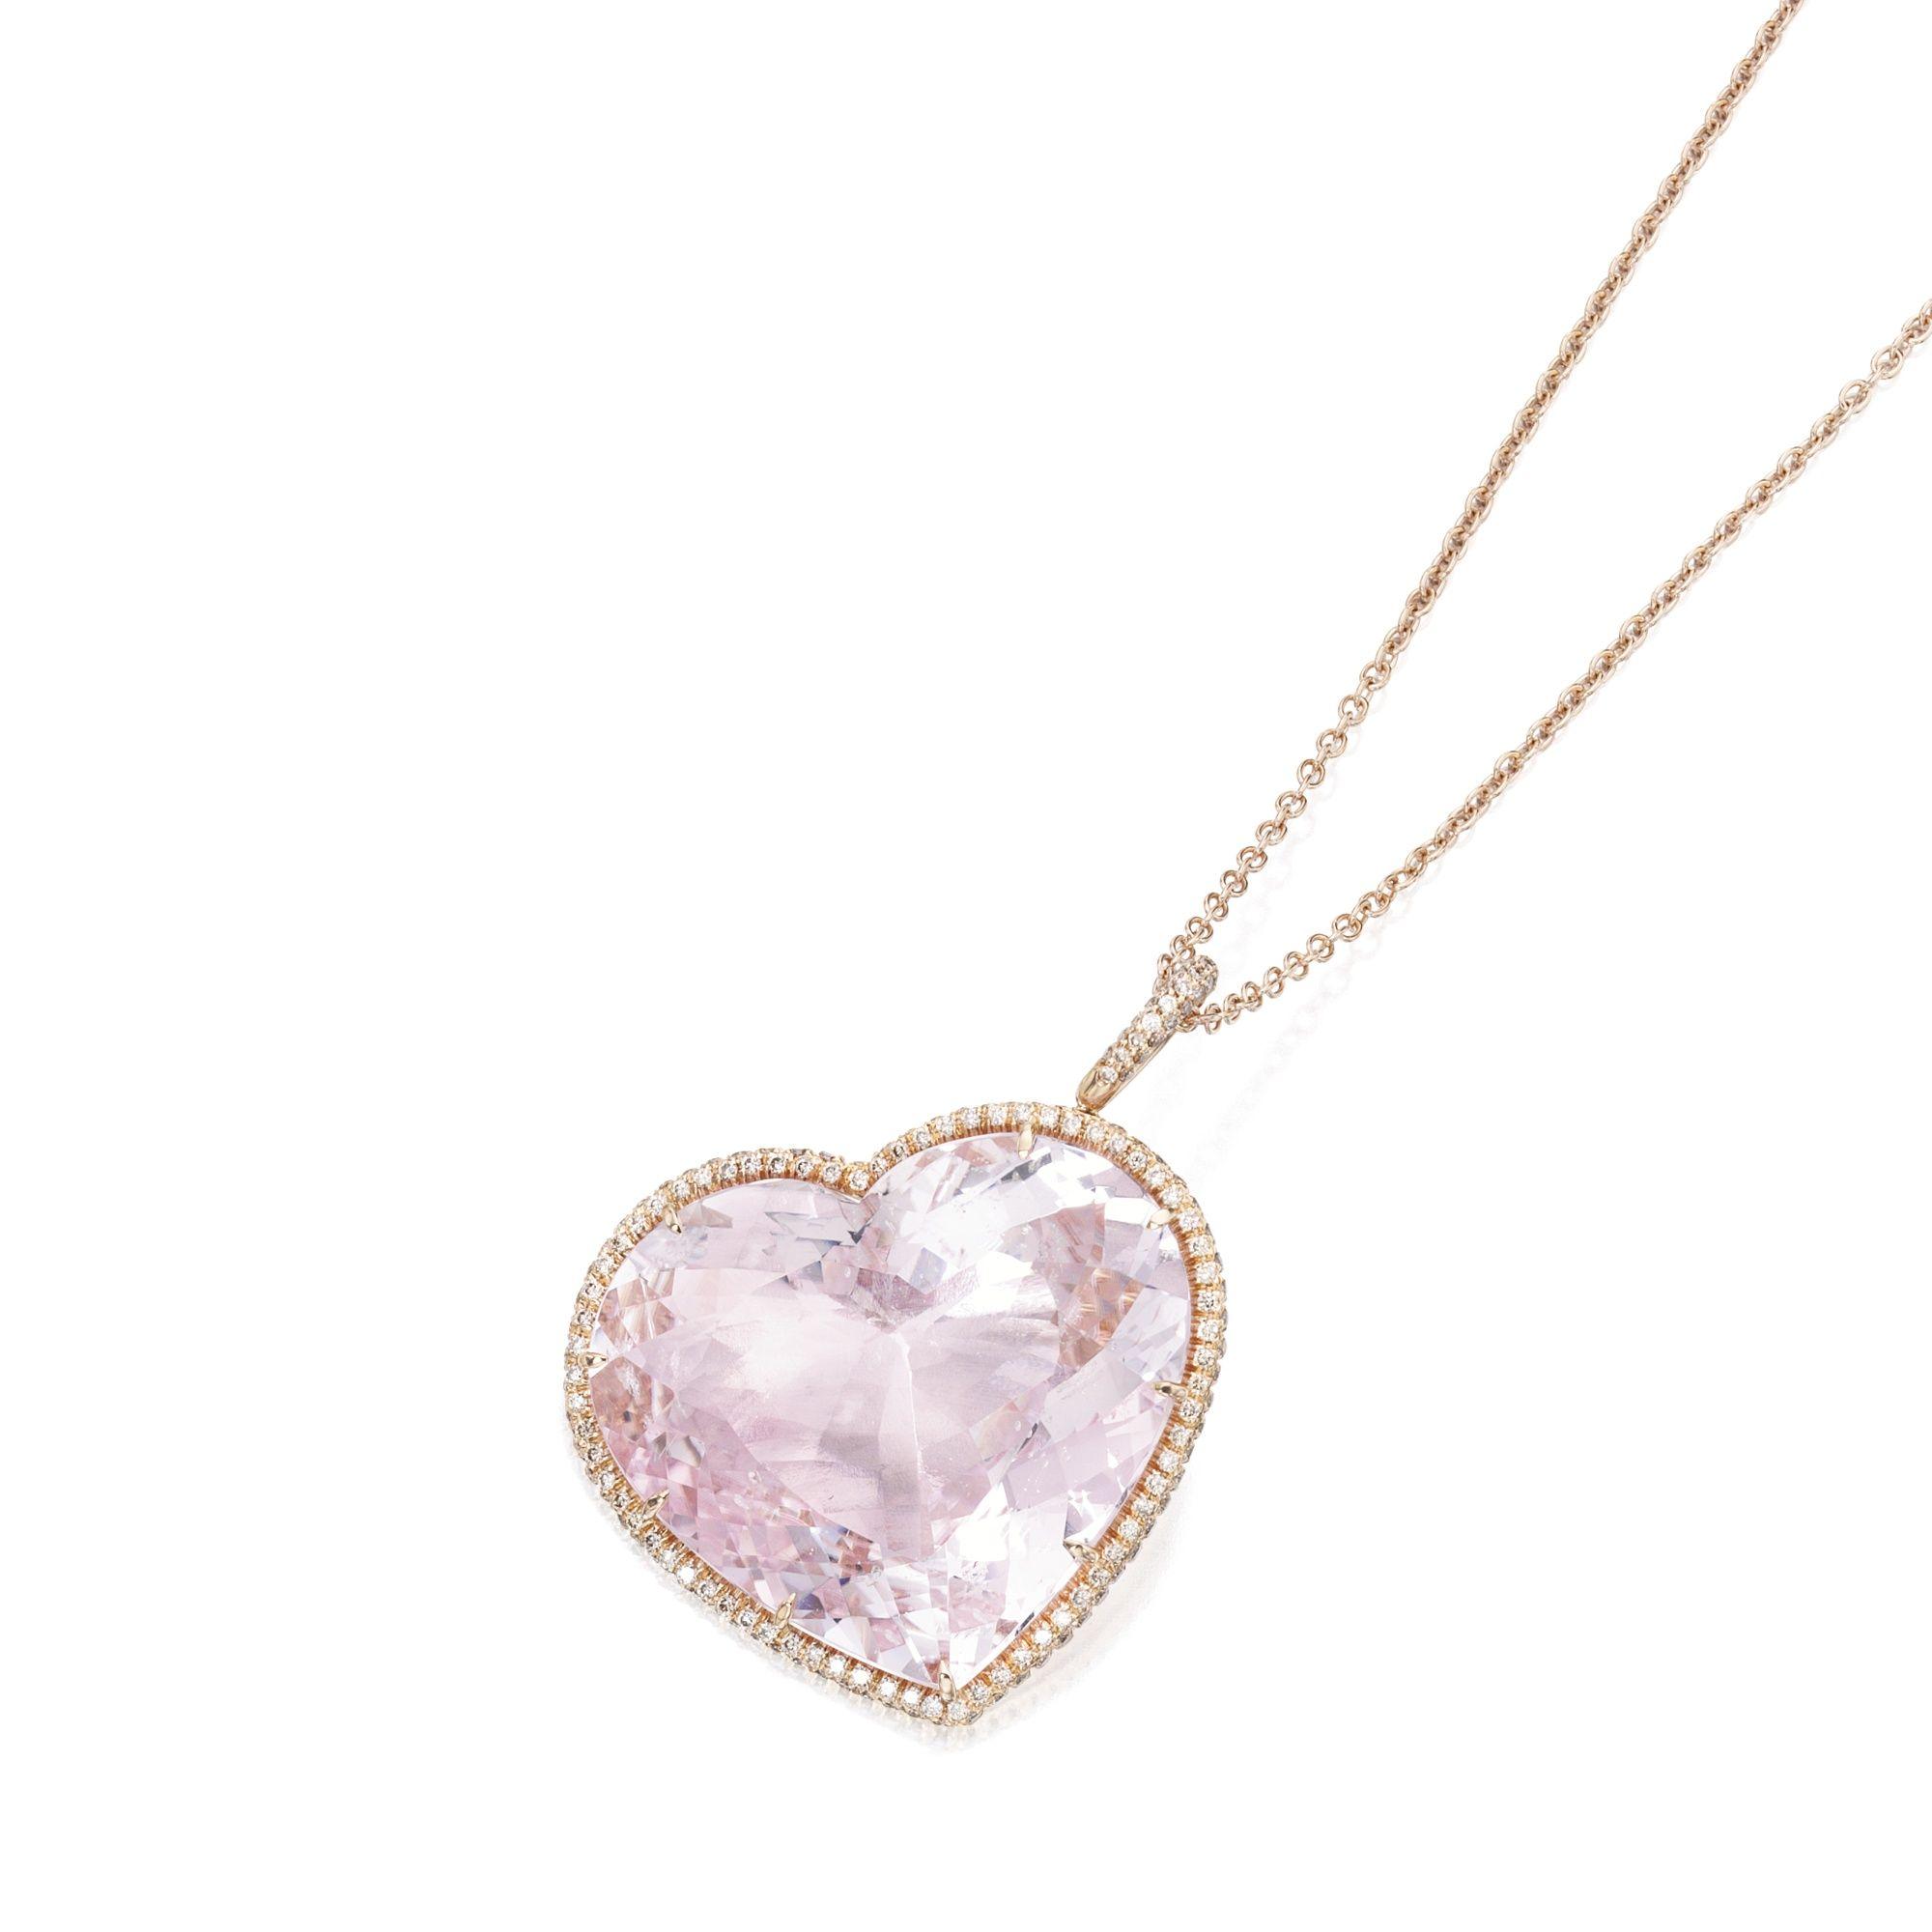 18 CARAT ROSE GOLD, MORGANITE AND COLORED DIAMOND PENDANT-NECKLACE, MARGHERITA BURGENER